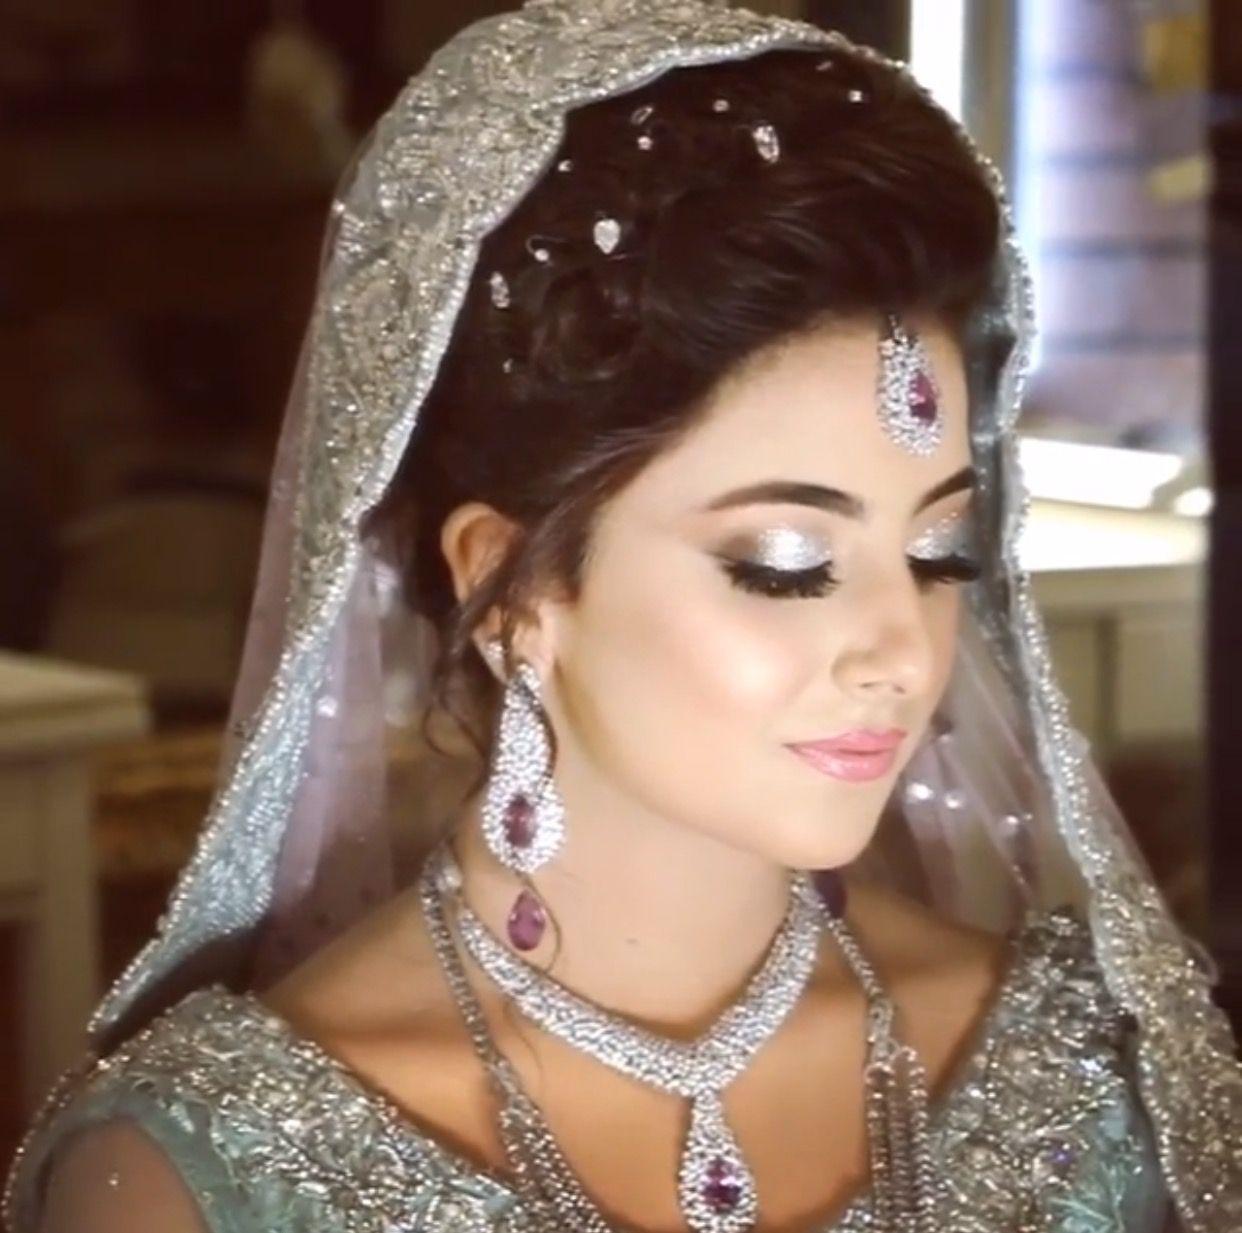 pin by shabnam jabeen on pakistan wedding | pinterest | pakistani